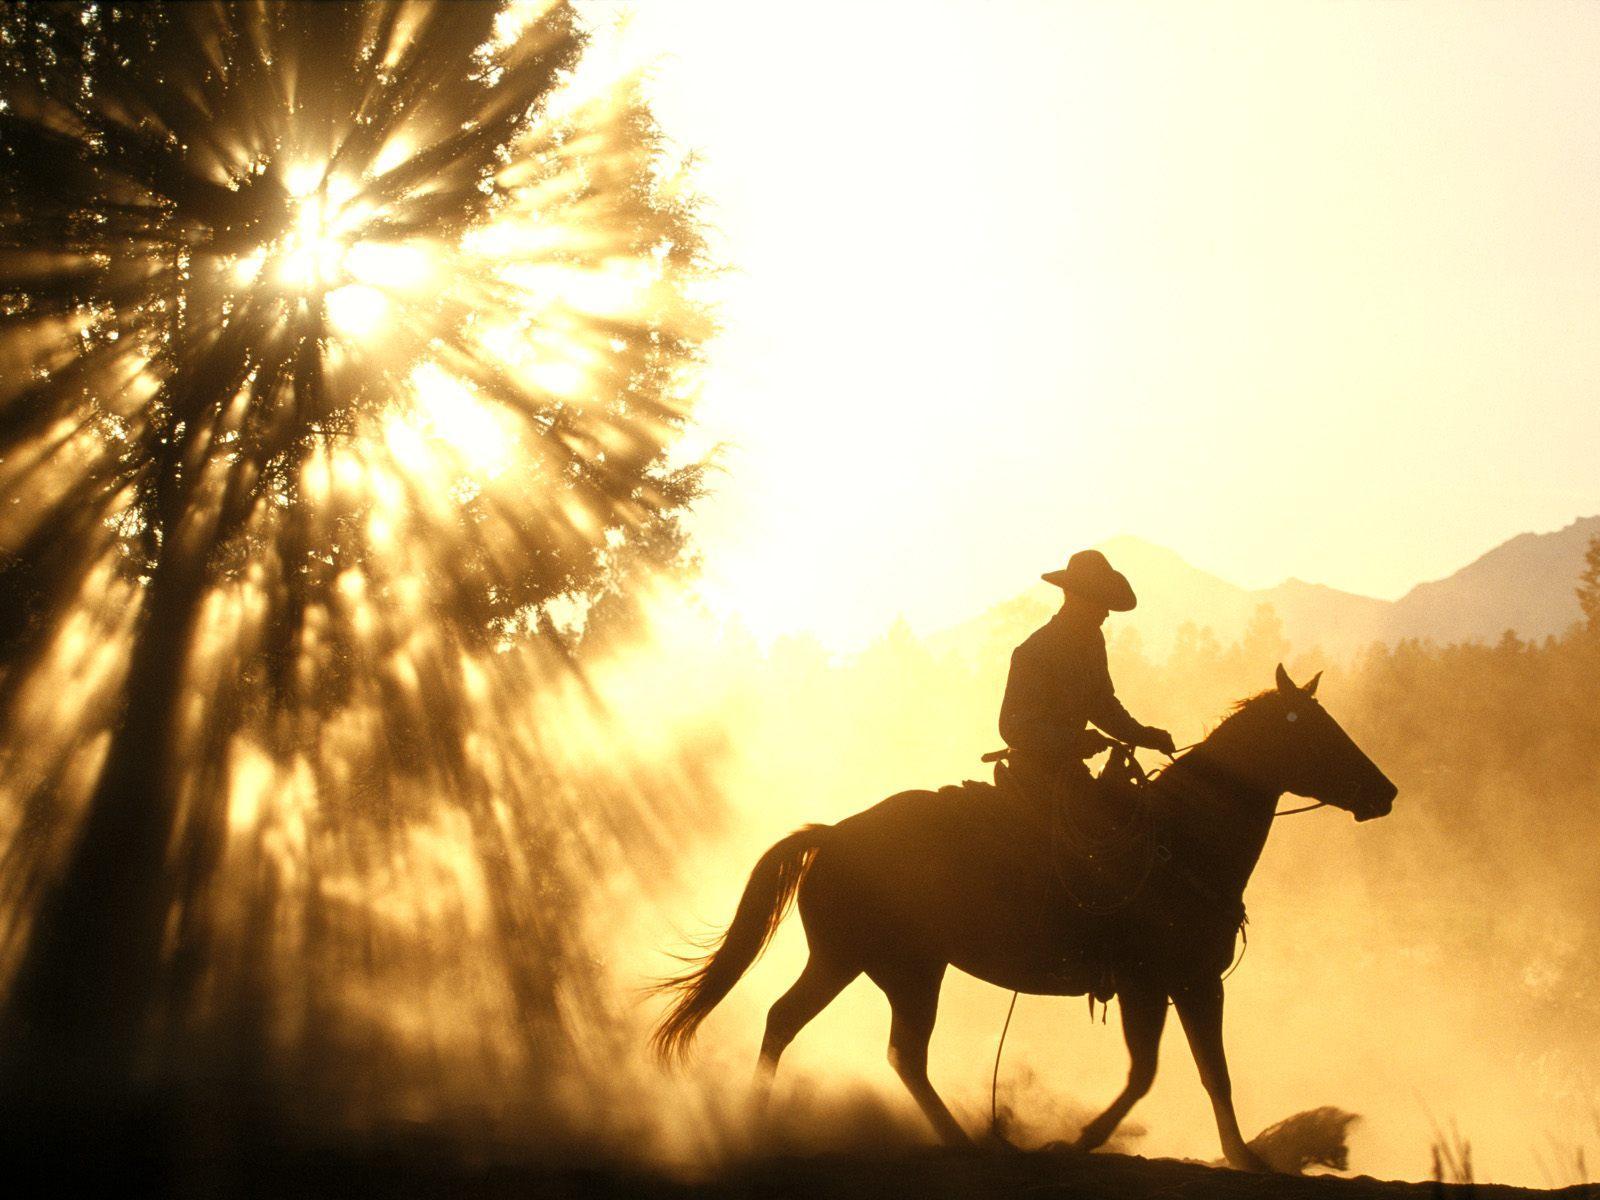 cowboy horse sunset desktop wallpaper download cowboy horse 1600x1200